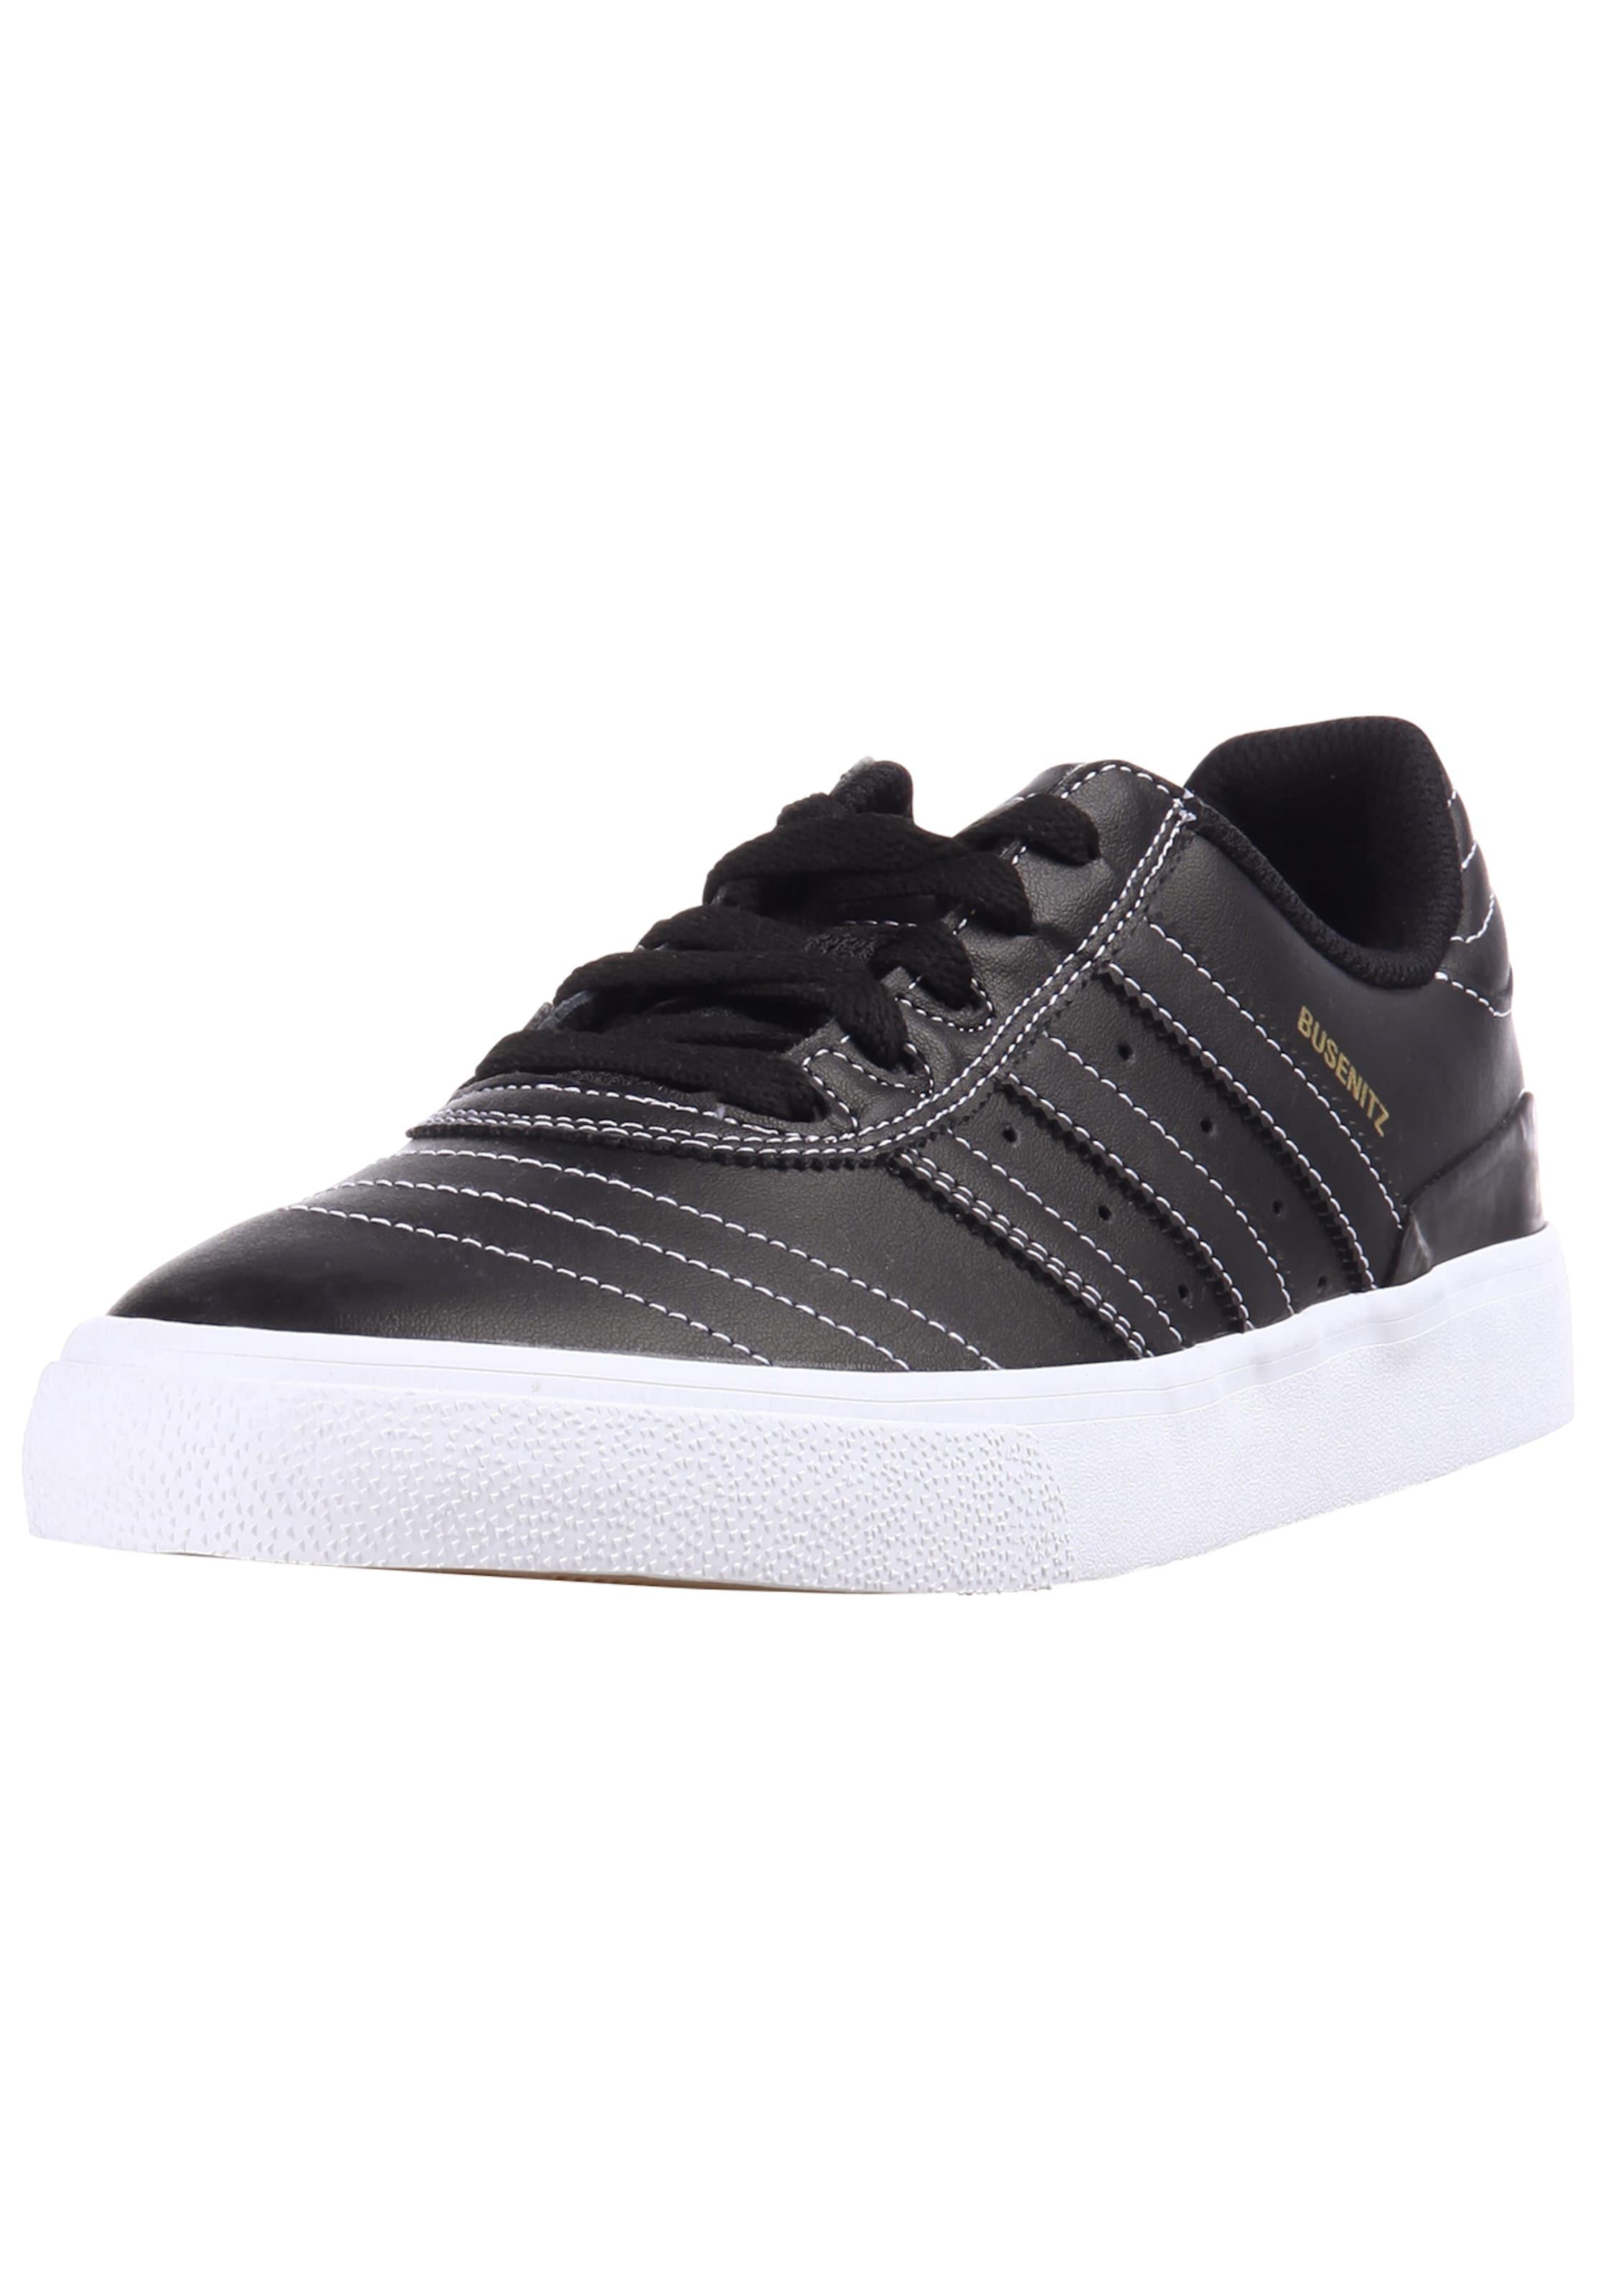 ADIDAS ORIGINALS Busenitz Vulc Sneaker Hohe Qualität